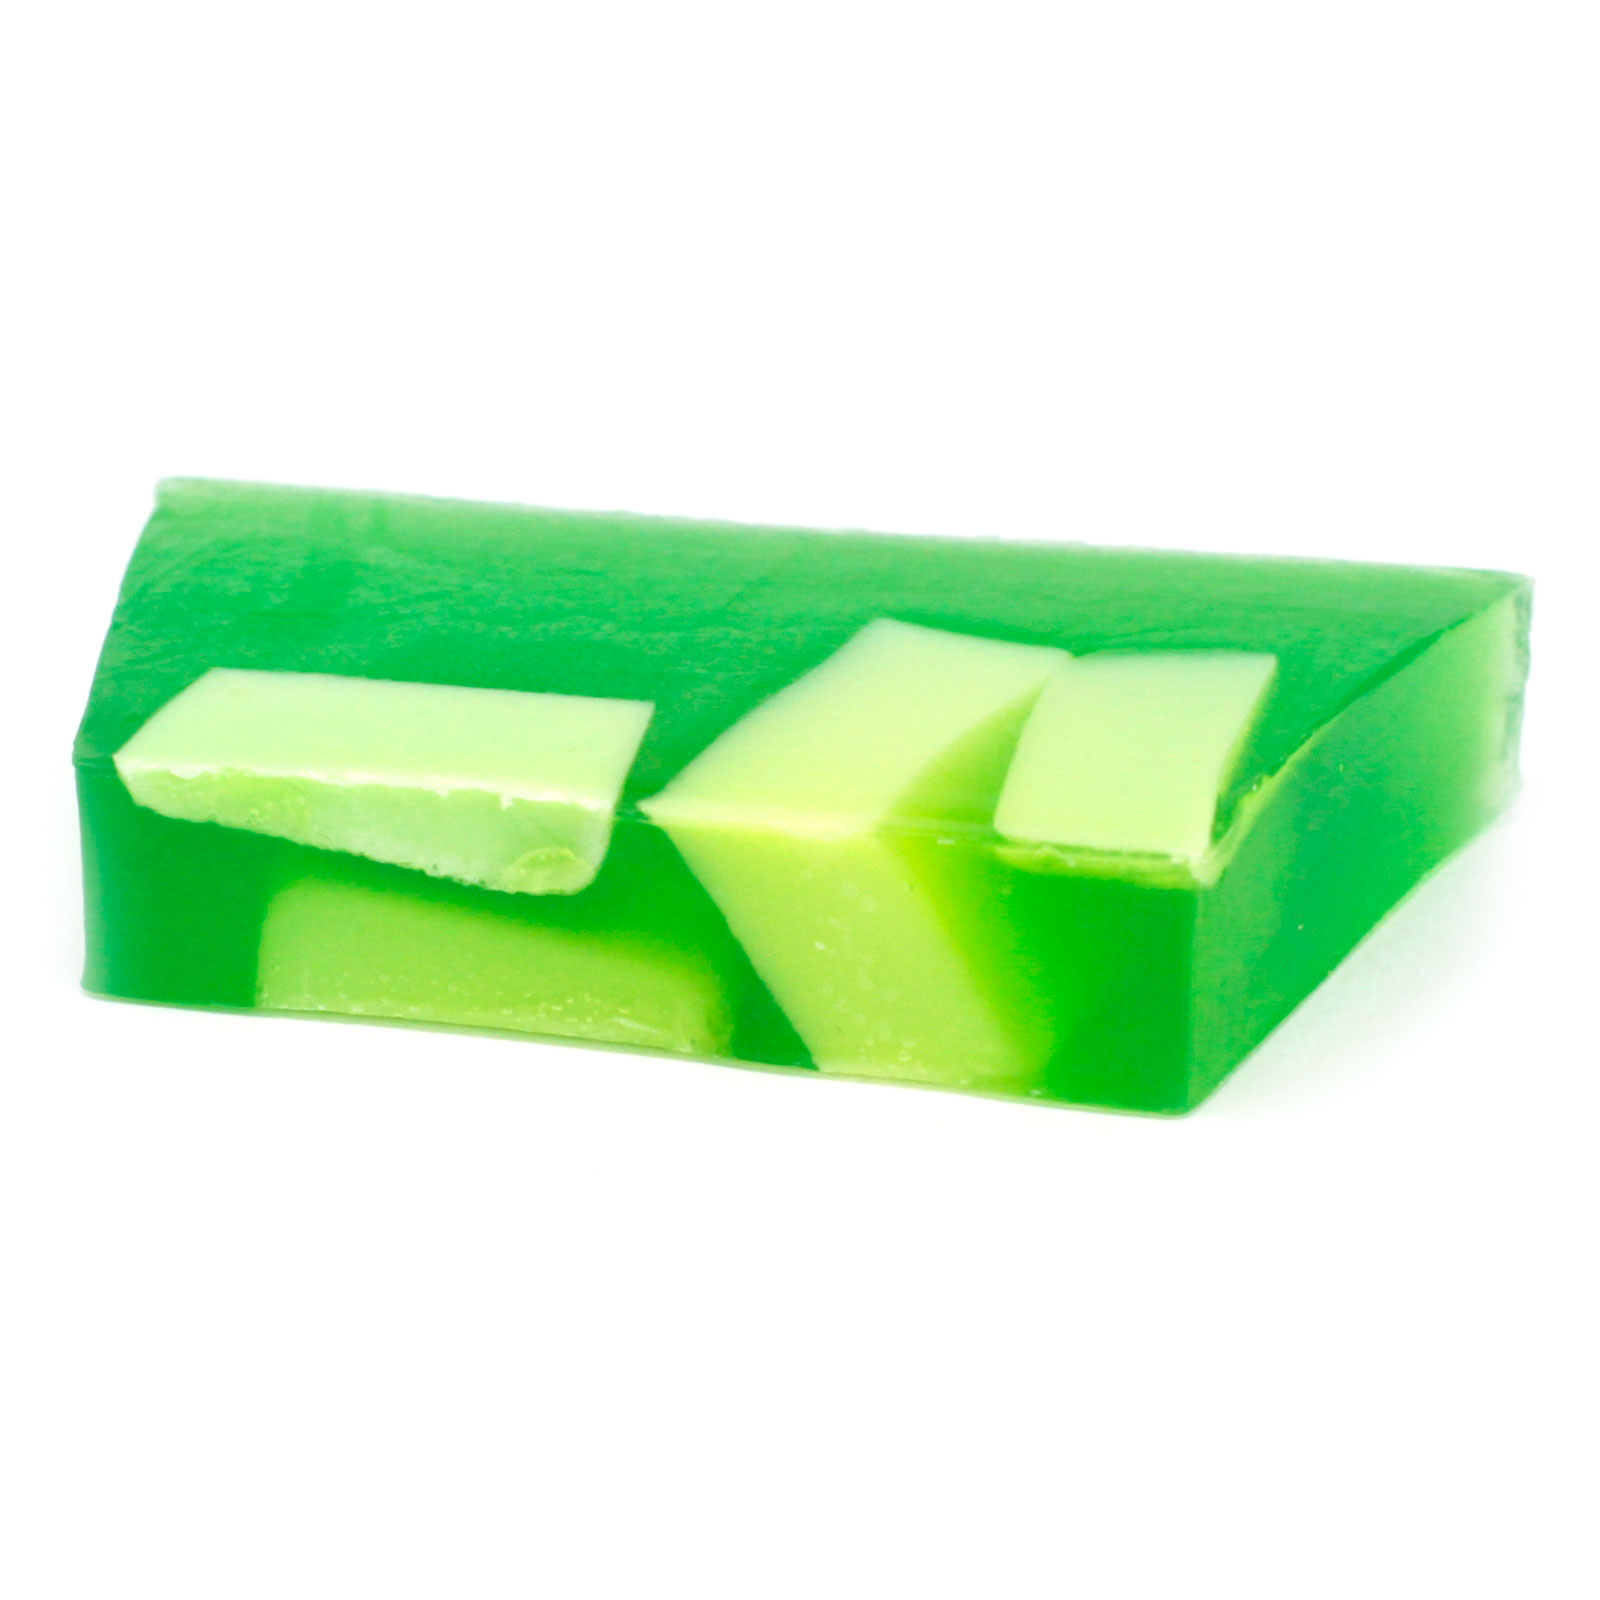 Lovely Melon Per Piece Approx 100g